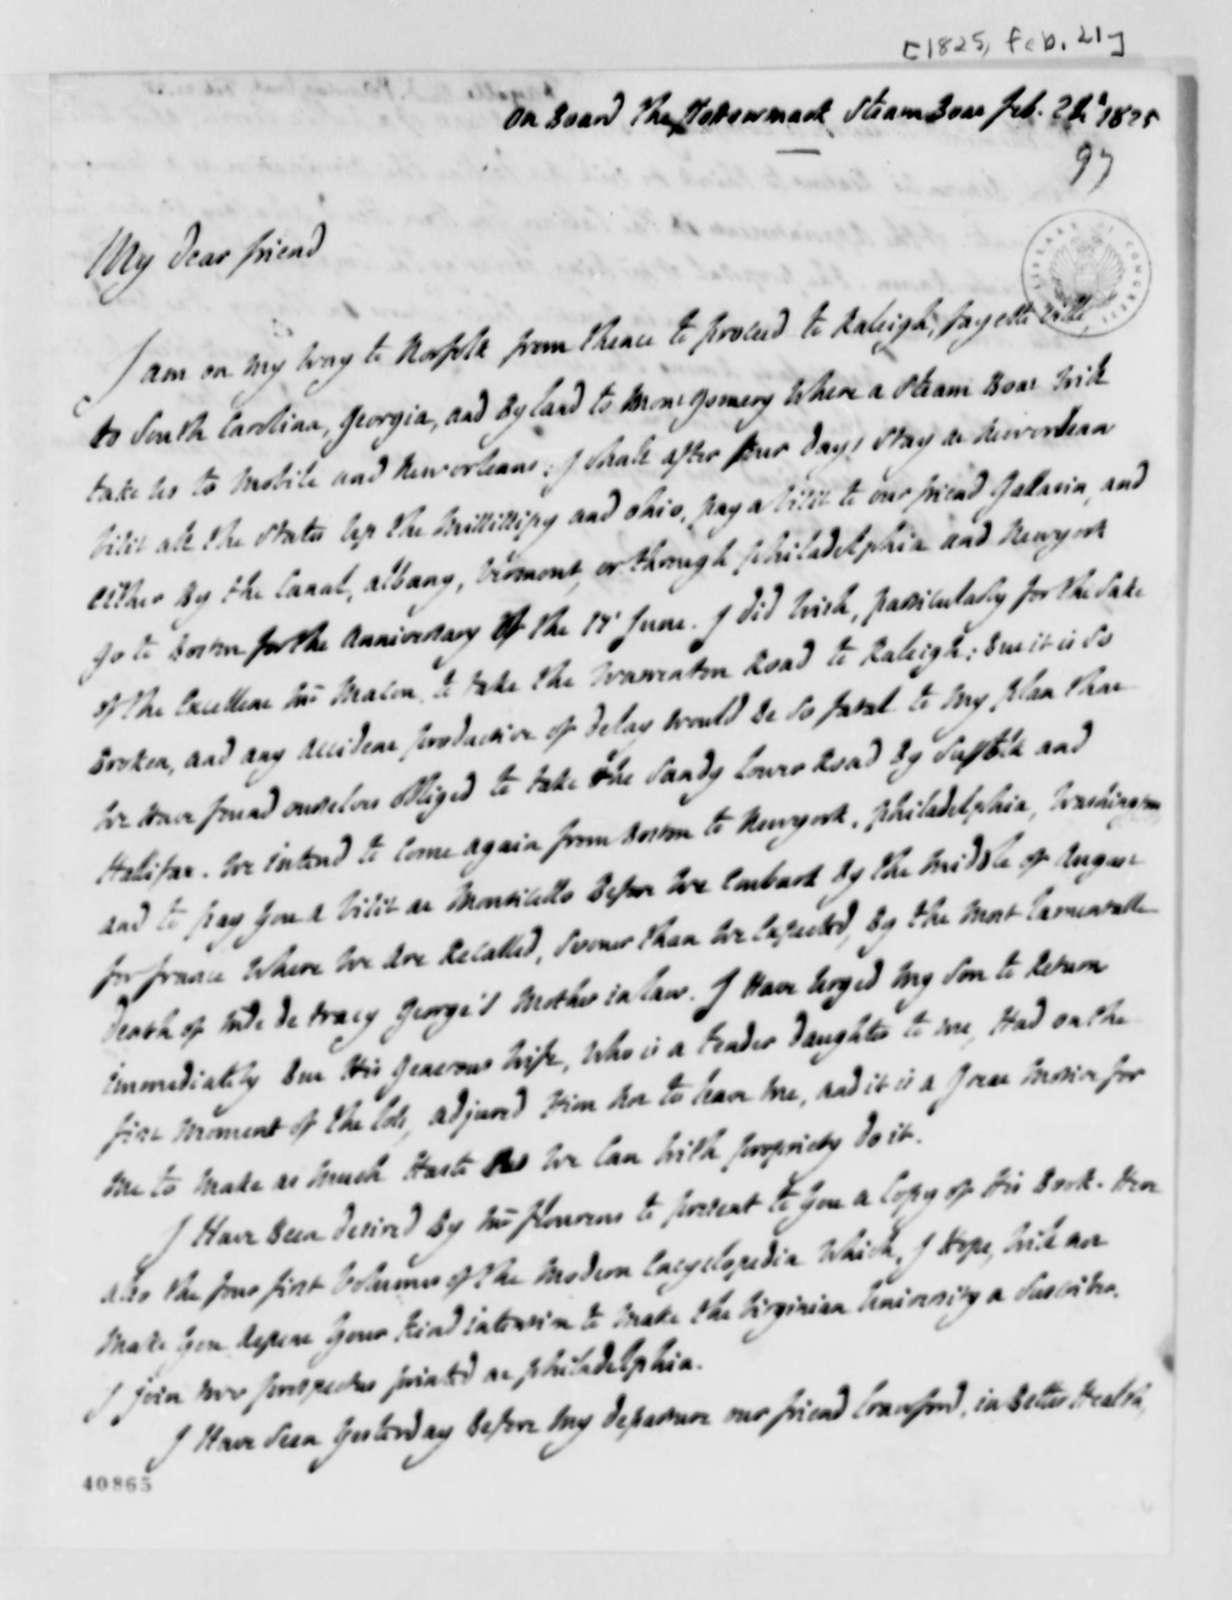 Marie Joseph Paul Yves Roch Gilbert du Motier, Marquis de Lafayette to Thomas Jefferson, February 21, 1825